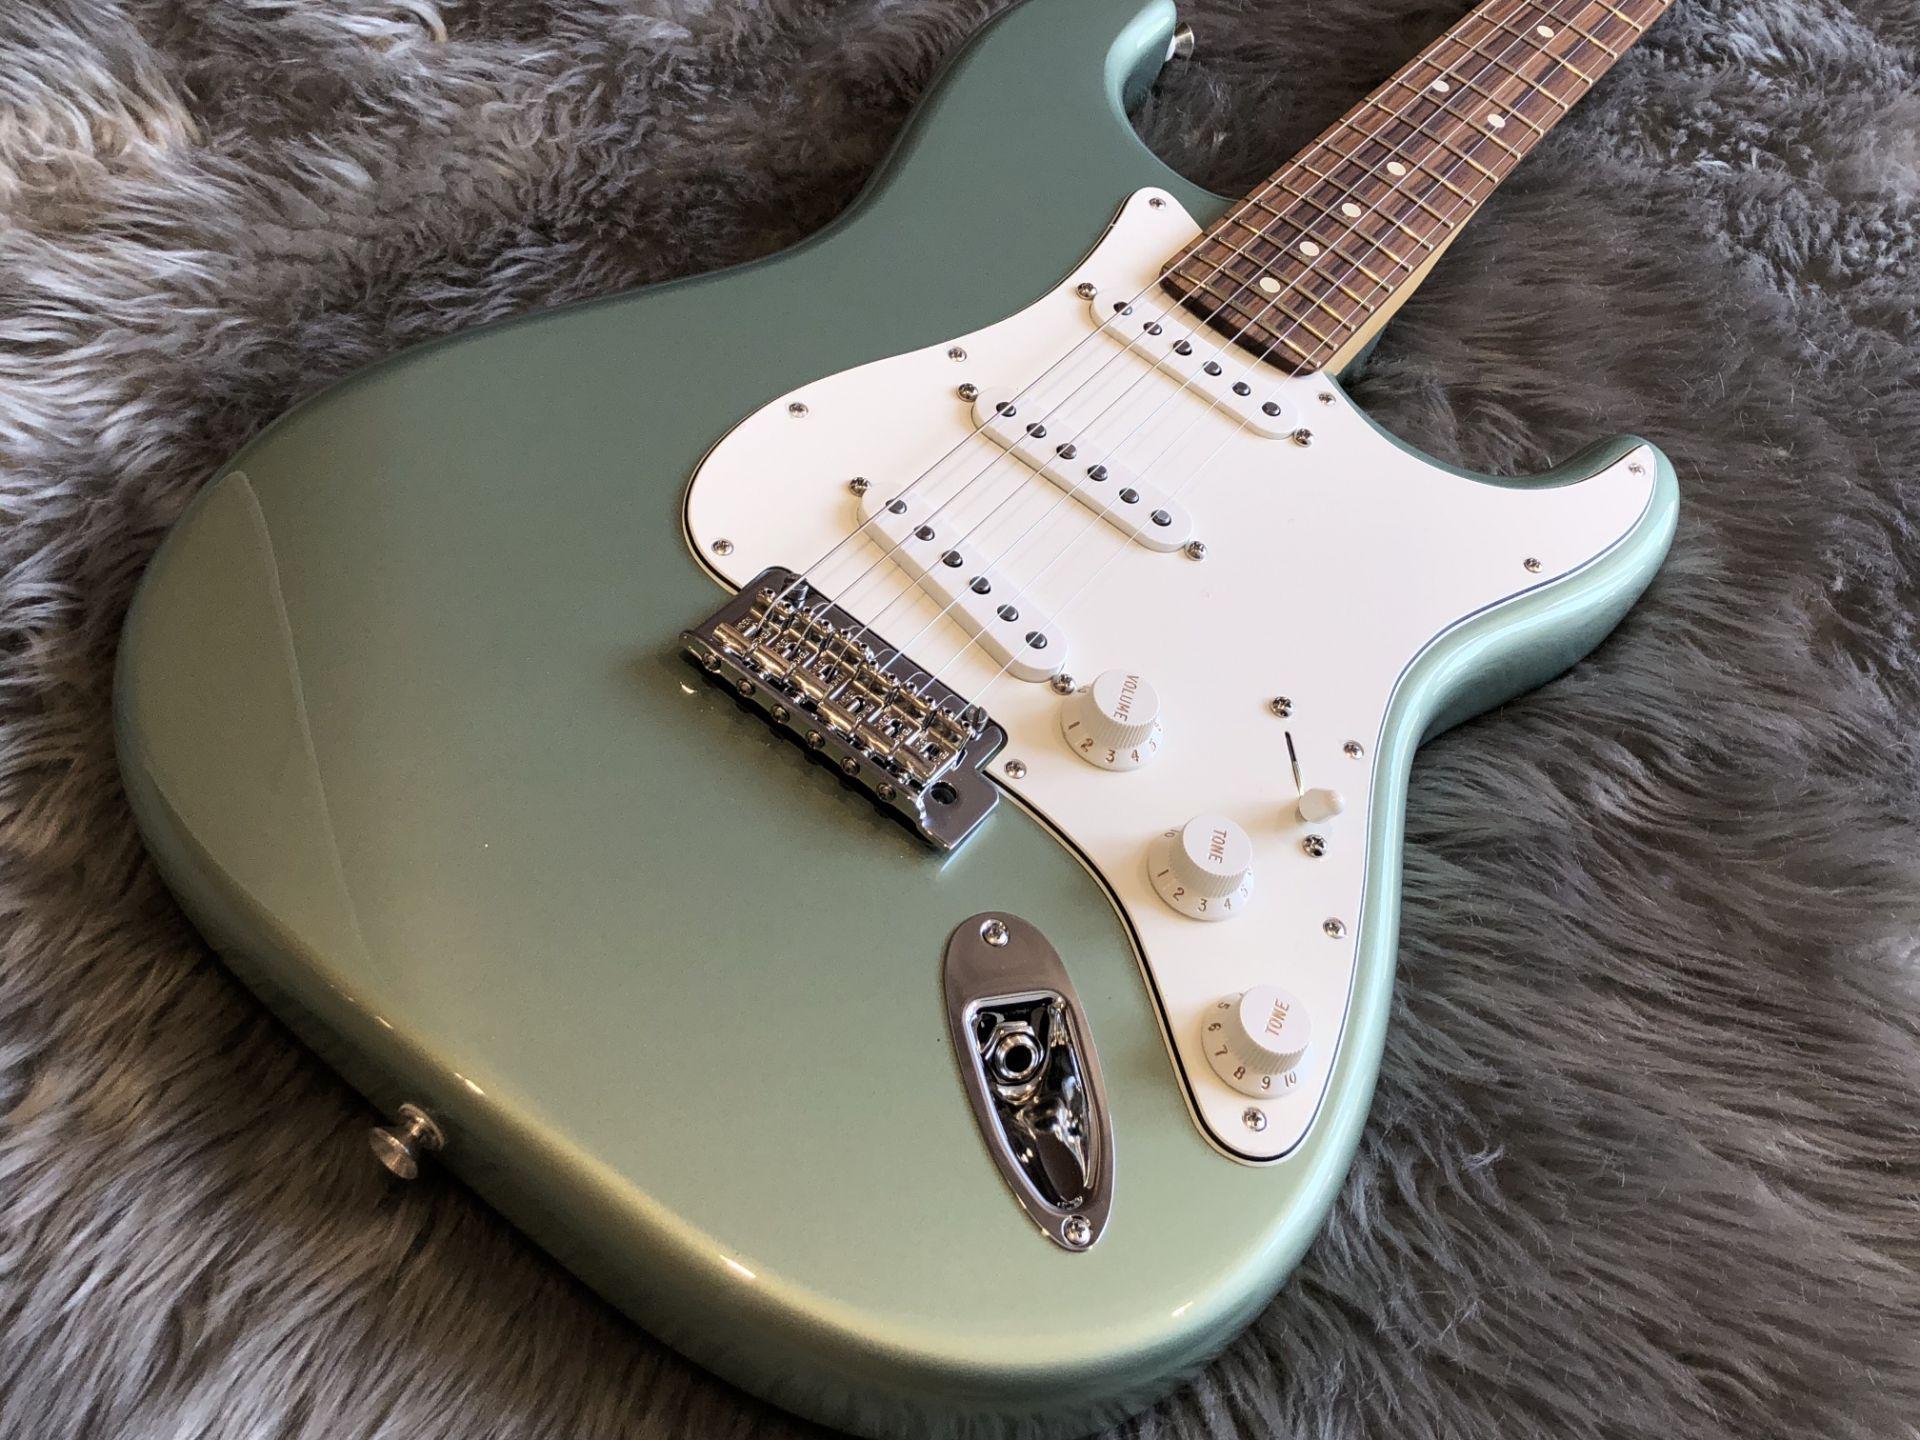 Player Stratocasterのボディトップ-アップ画像